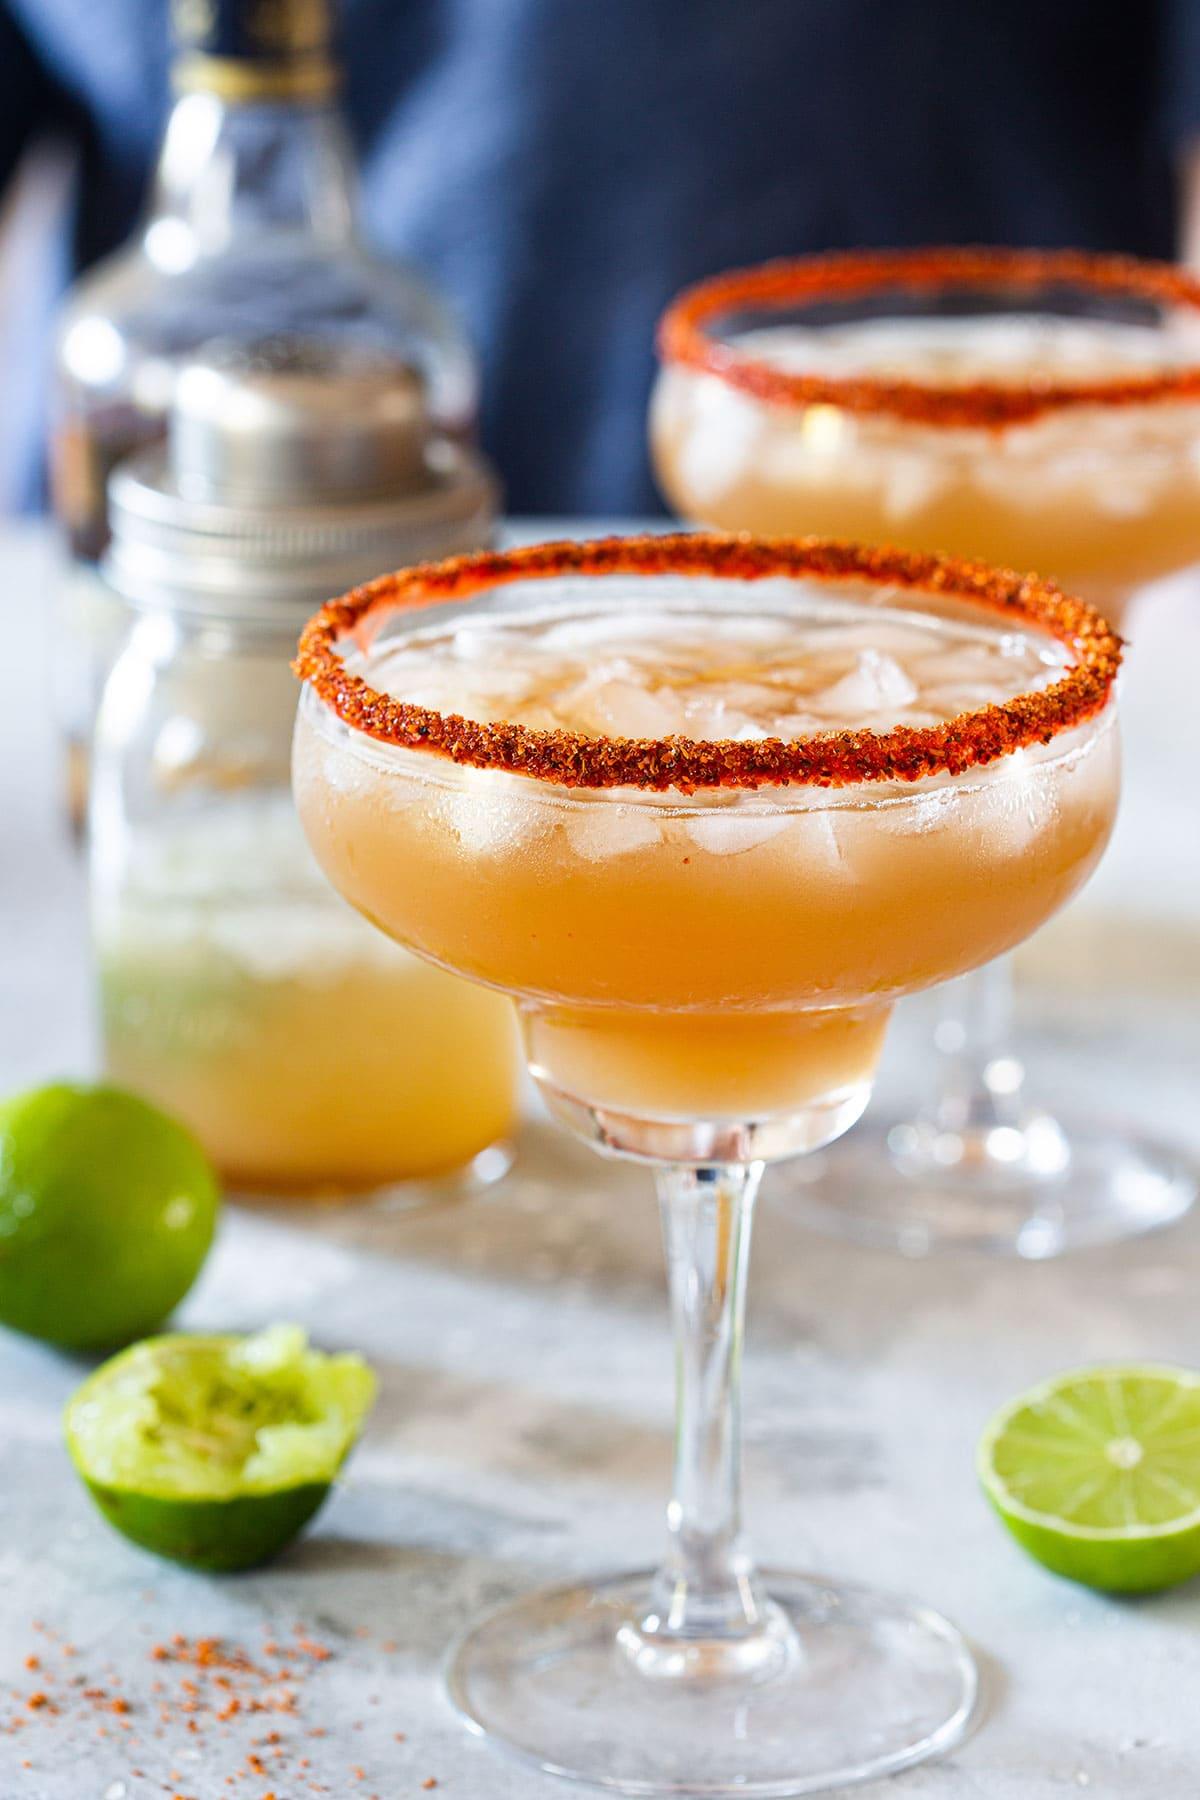 Tamarind Margarita cocktail.